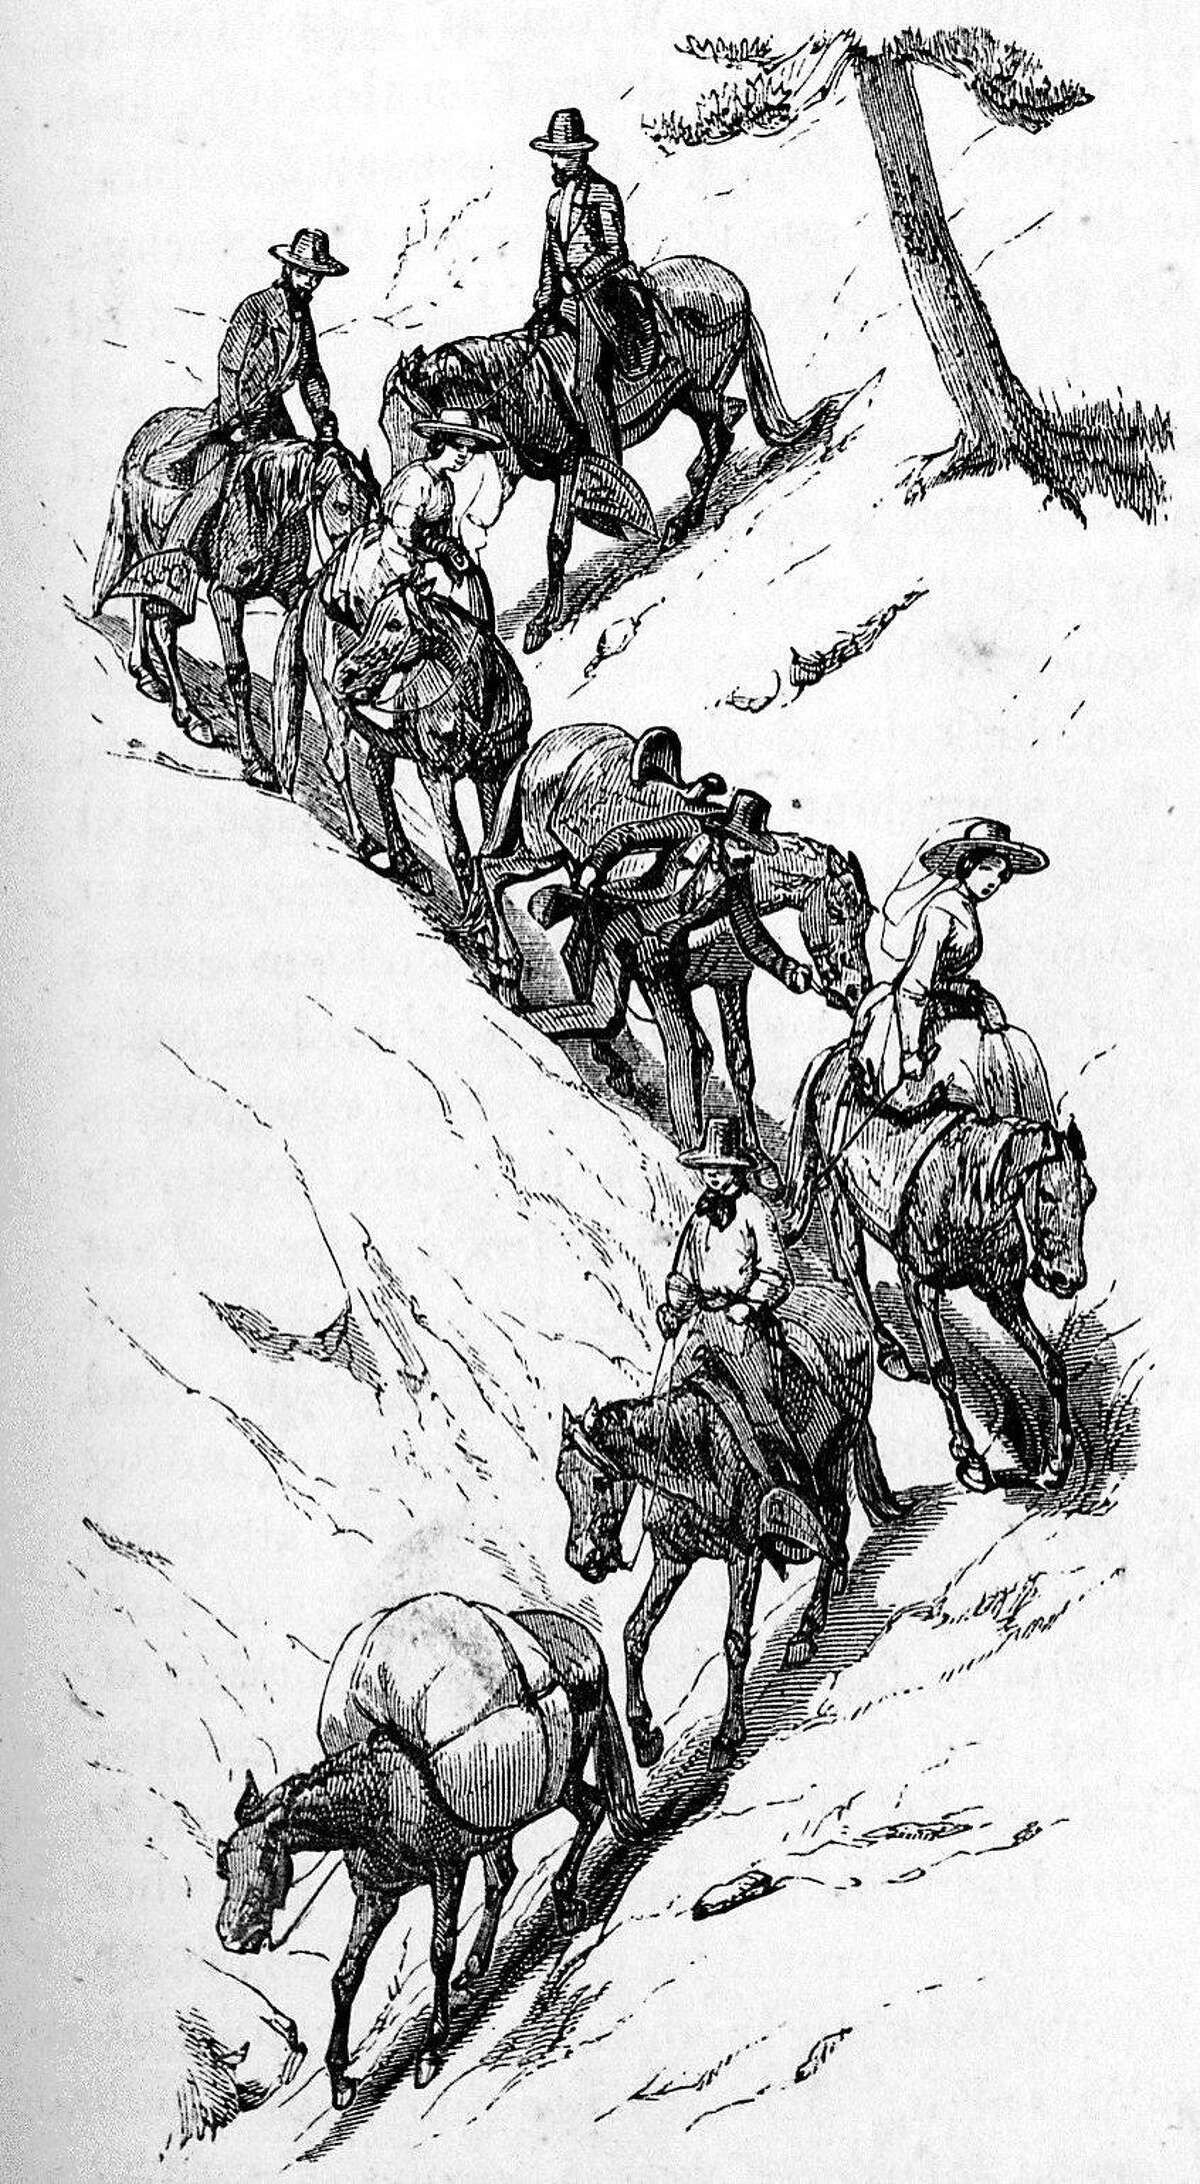 Descending into Yosemite Valley circa 1859.